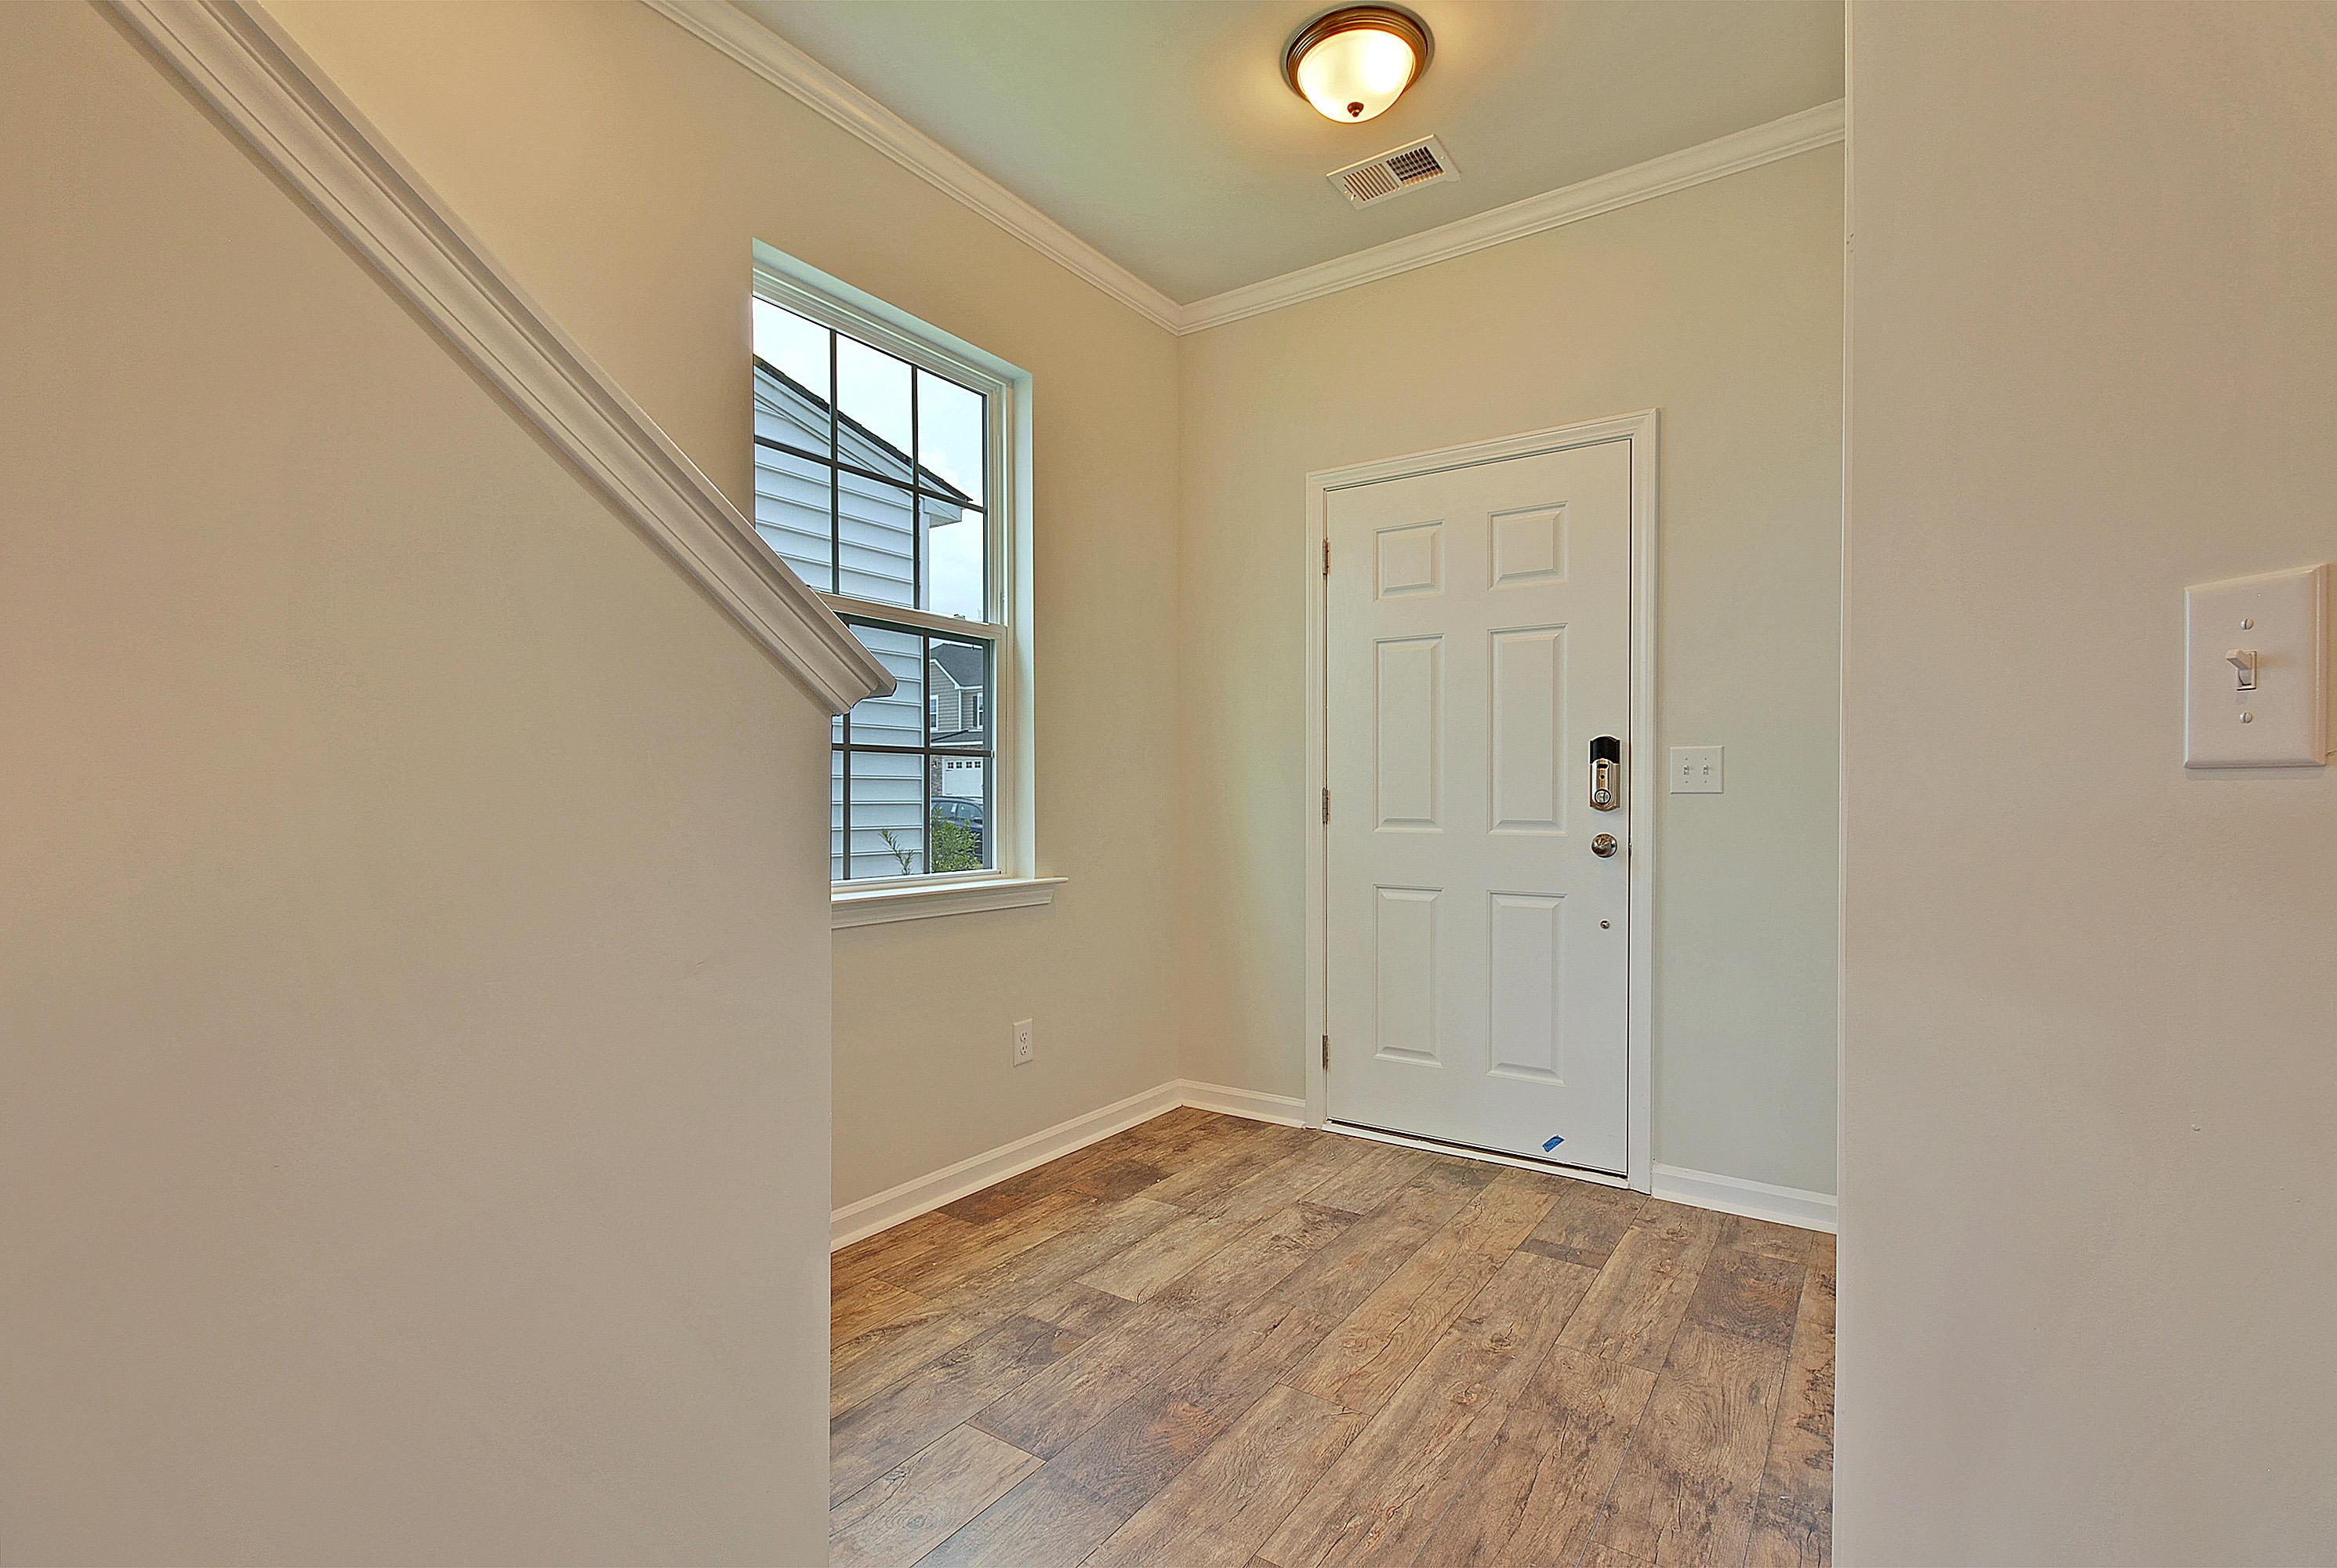 Coosaw Preserve Homes For Sale - 5162 Preserve Blvd, Ladson, SC - 29